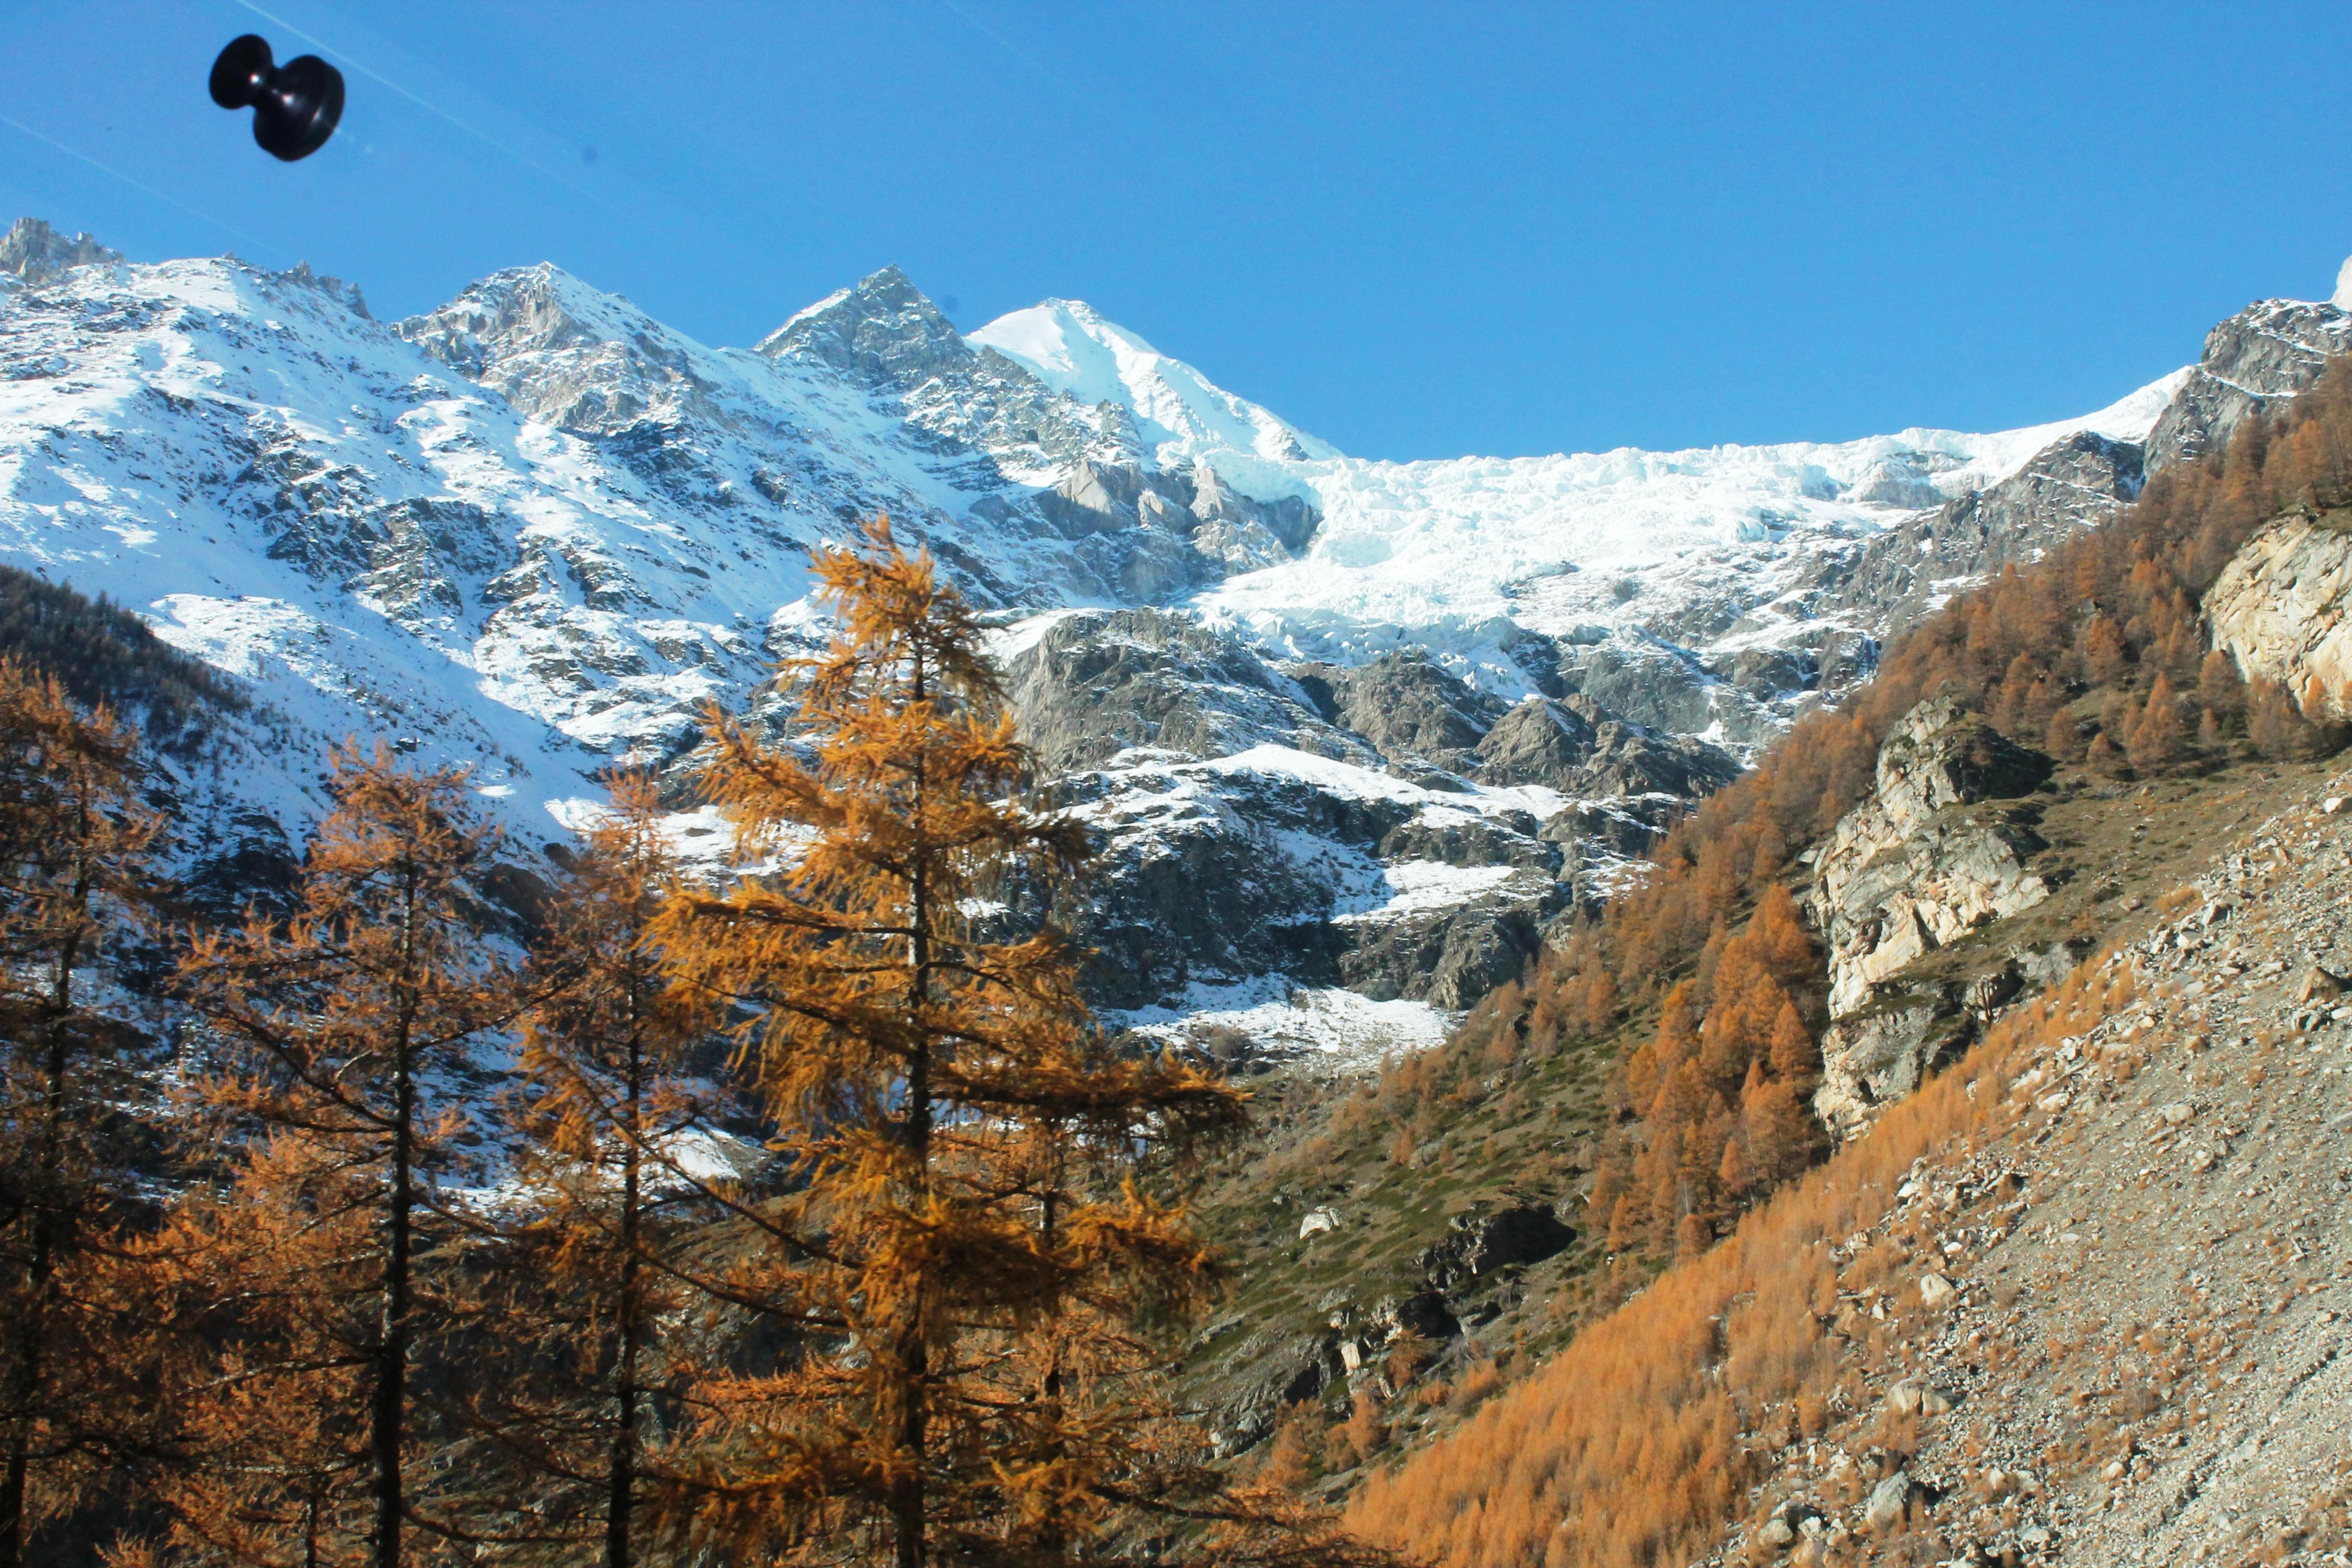 Paisaje que rodea Zermatt desde el tren cremallera